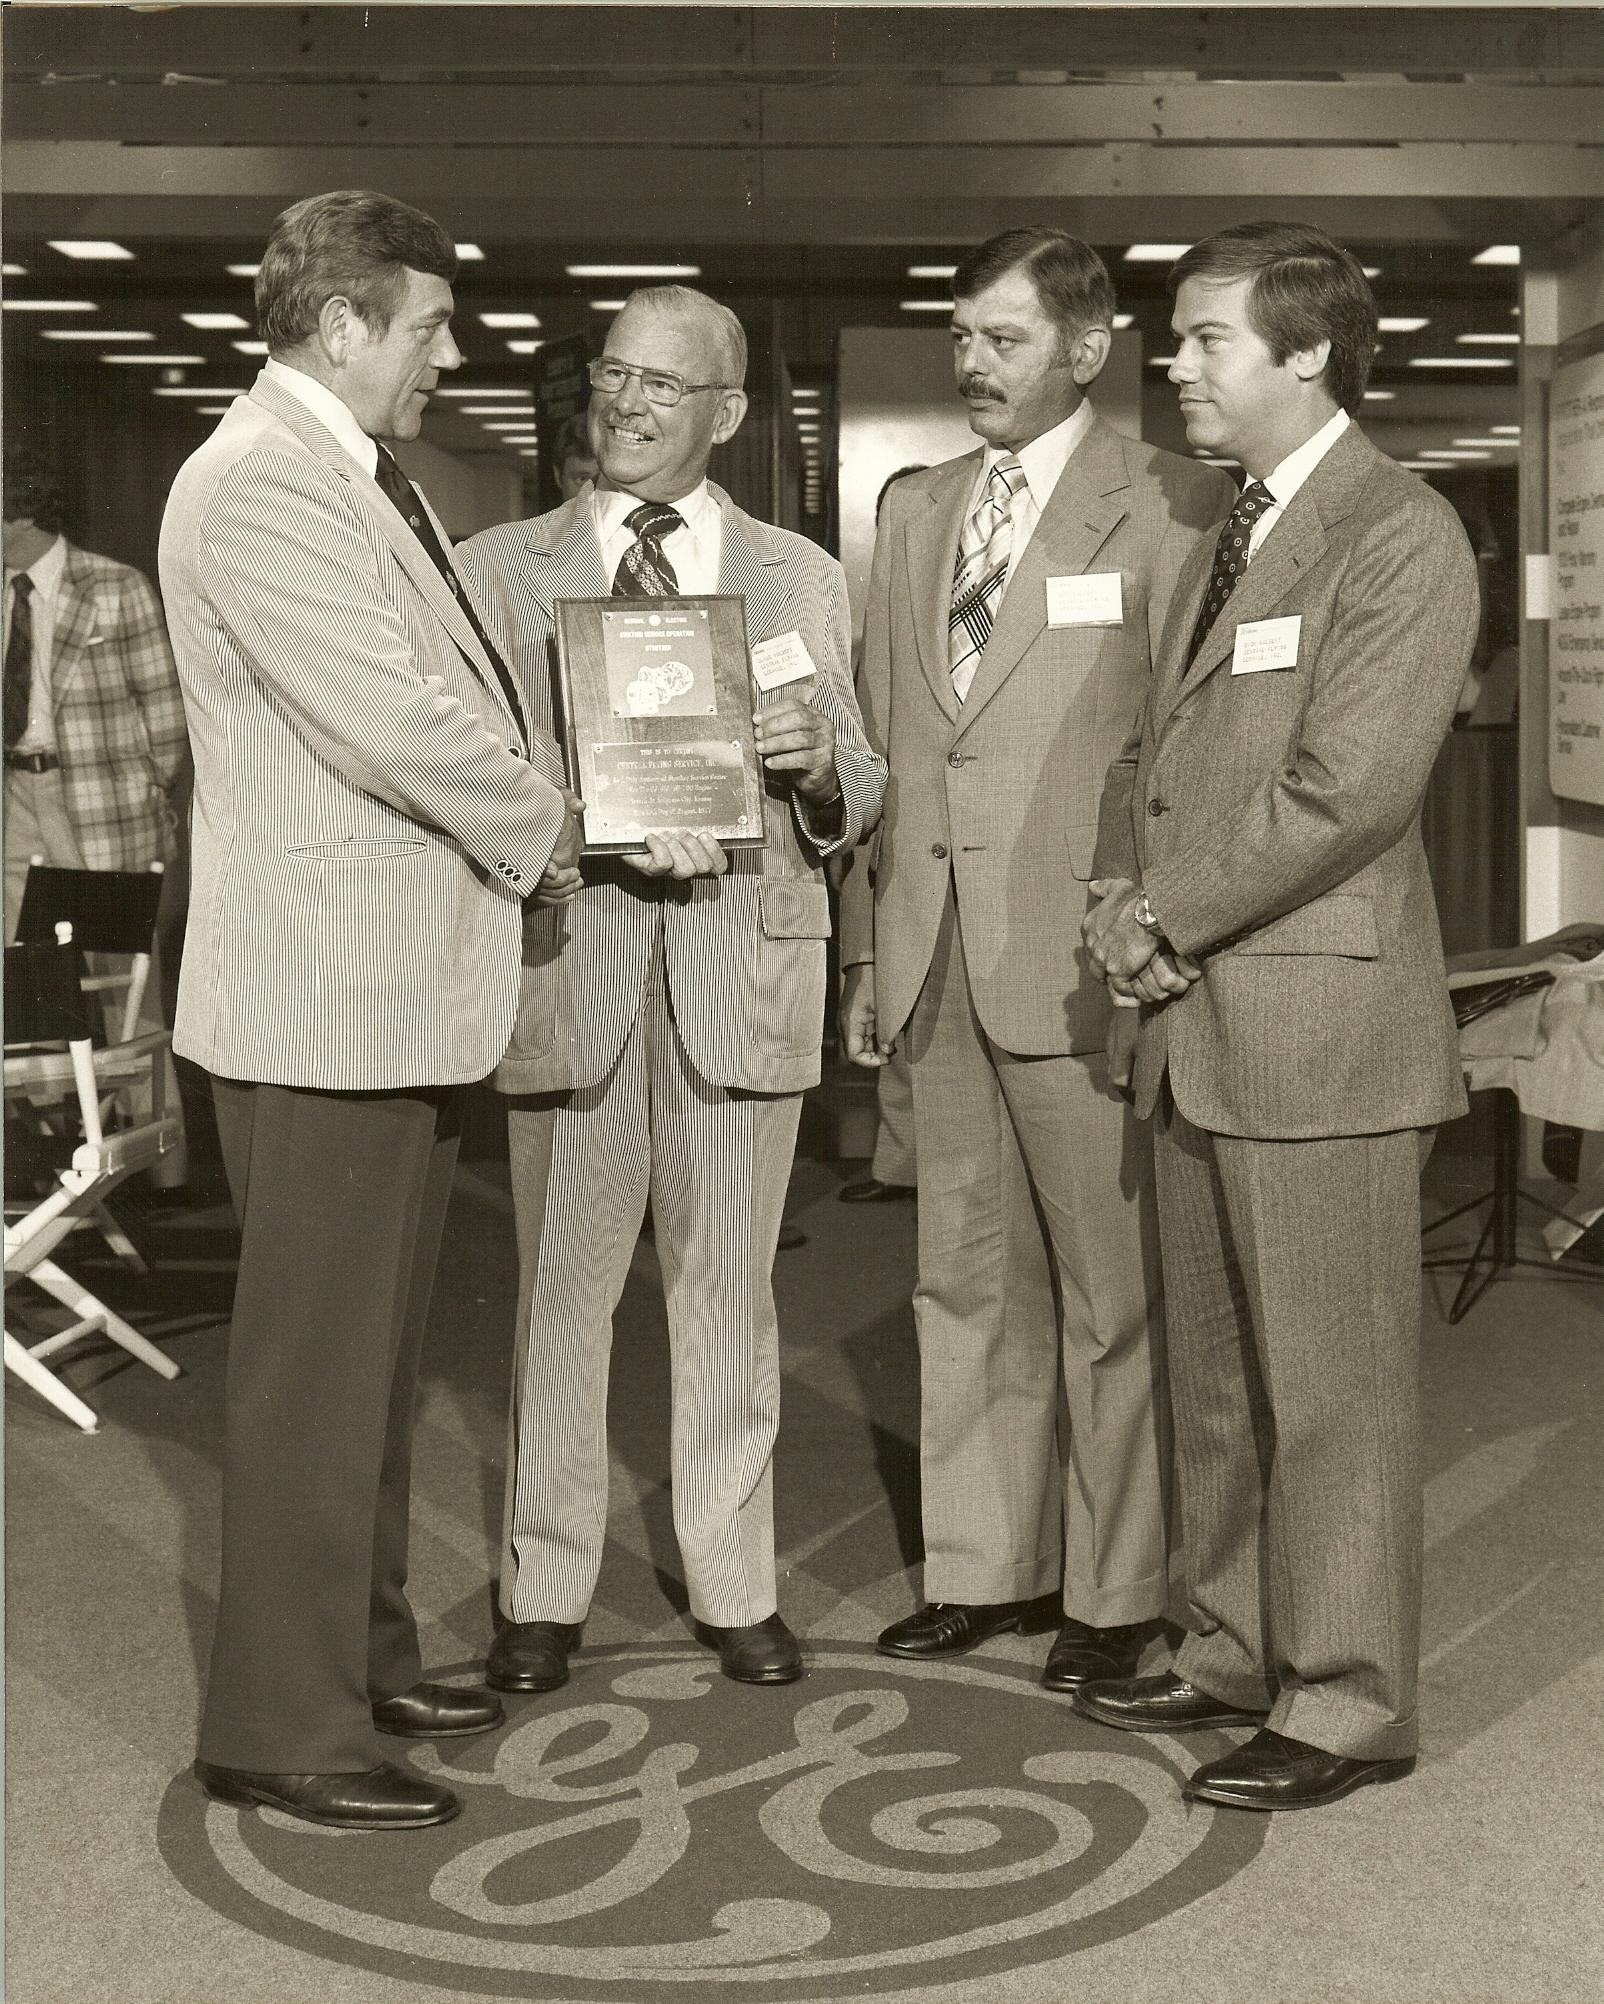 C. Holbert, R. Holbert, D holbert GE award late 1970s.jpg